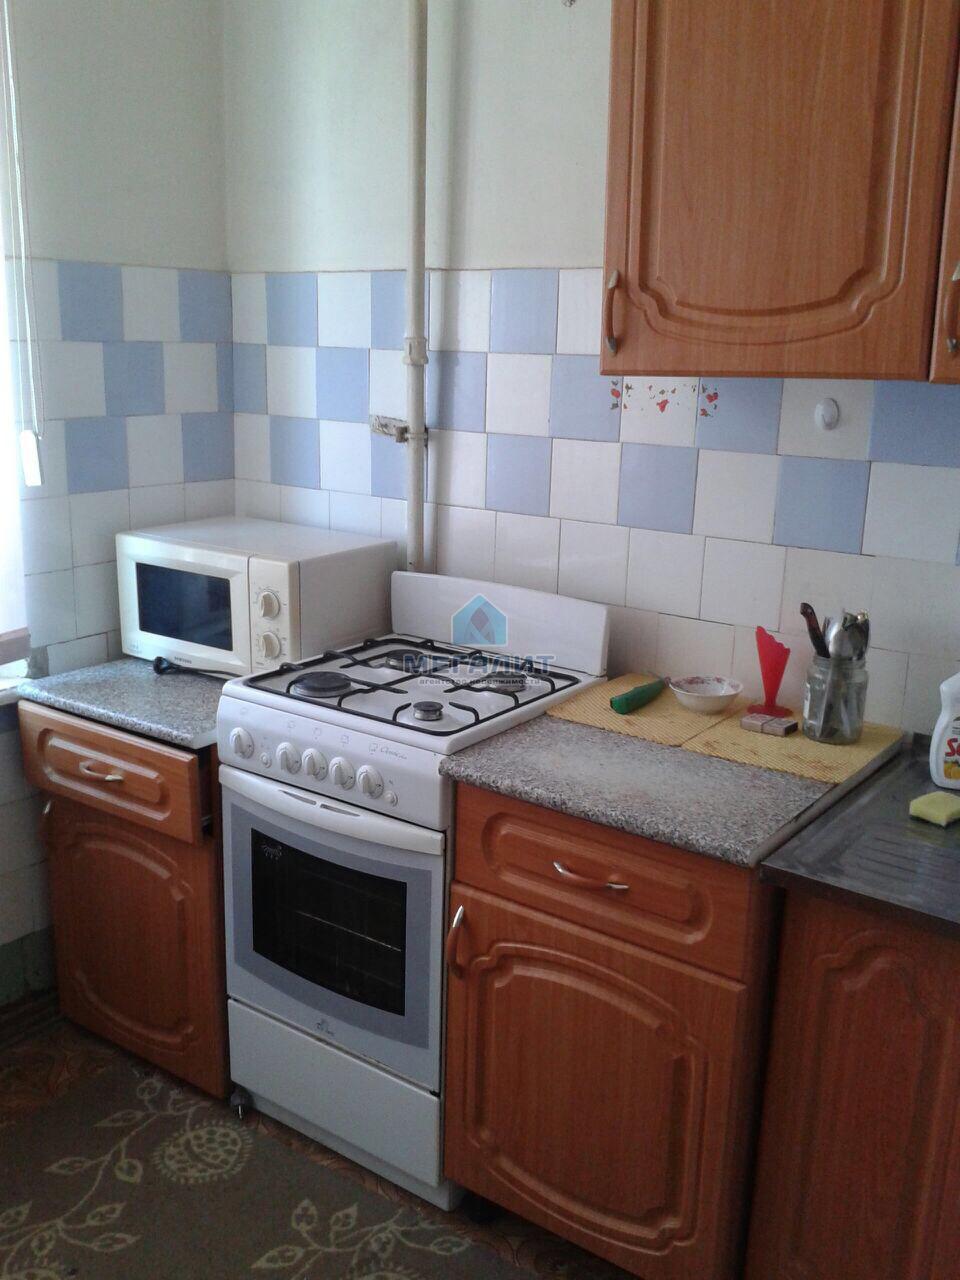 Аренда 2-к квартиры Николая Ершова 78, 47.0 м² (миниатюра №5)